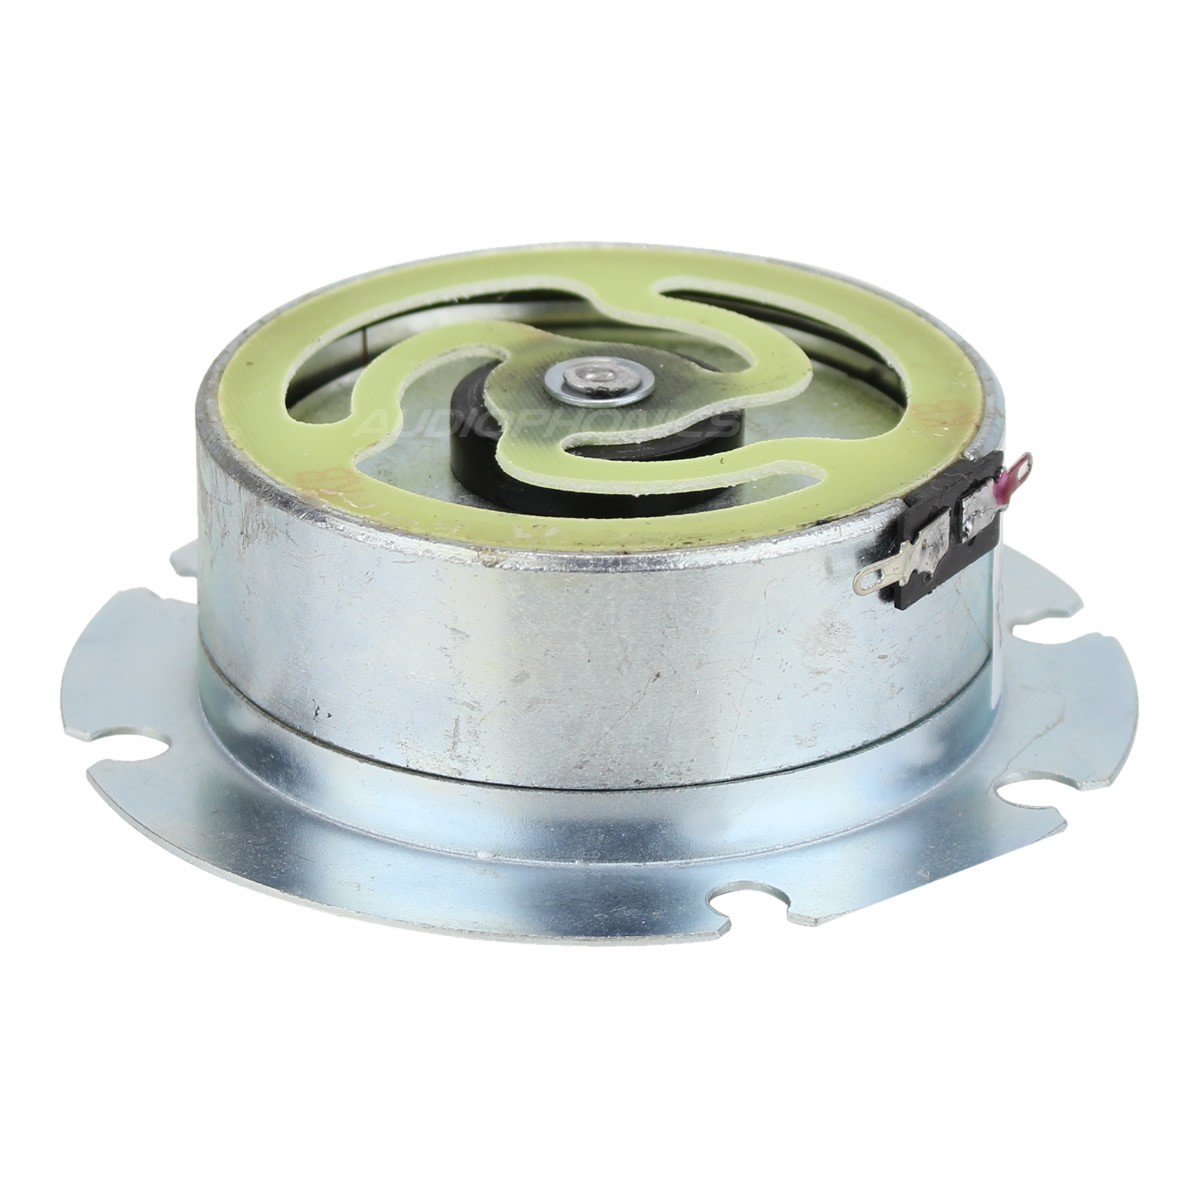 Haut-parleur vibreur Body shaker 100 W